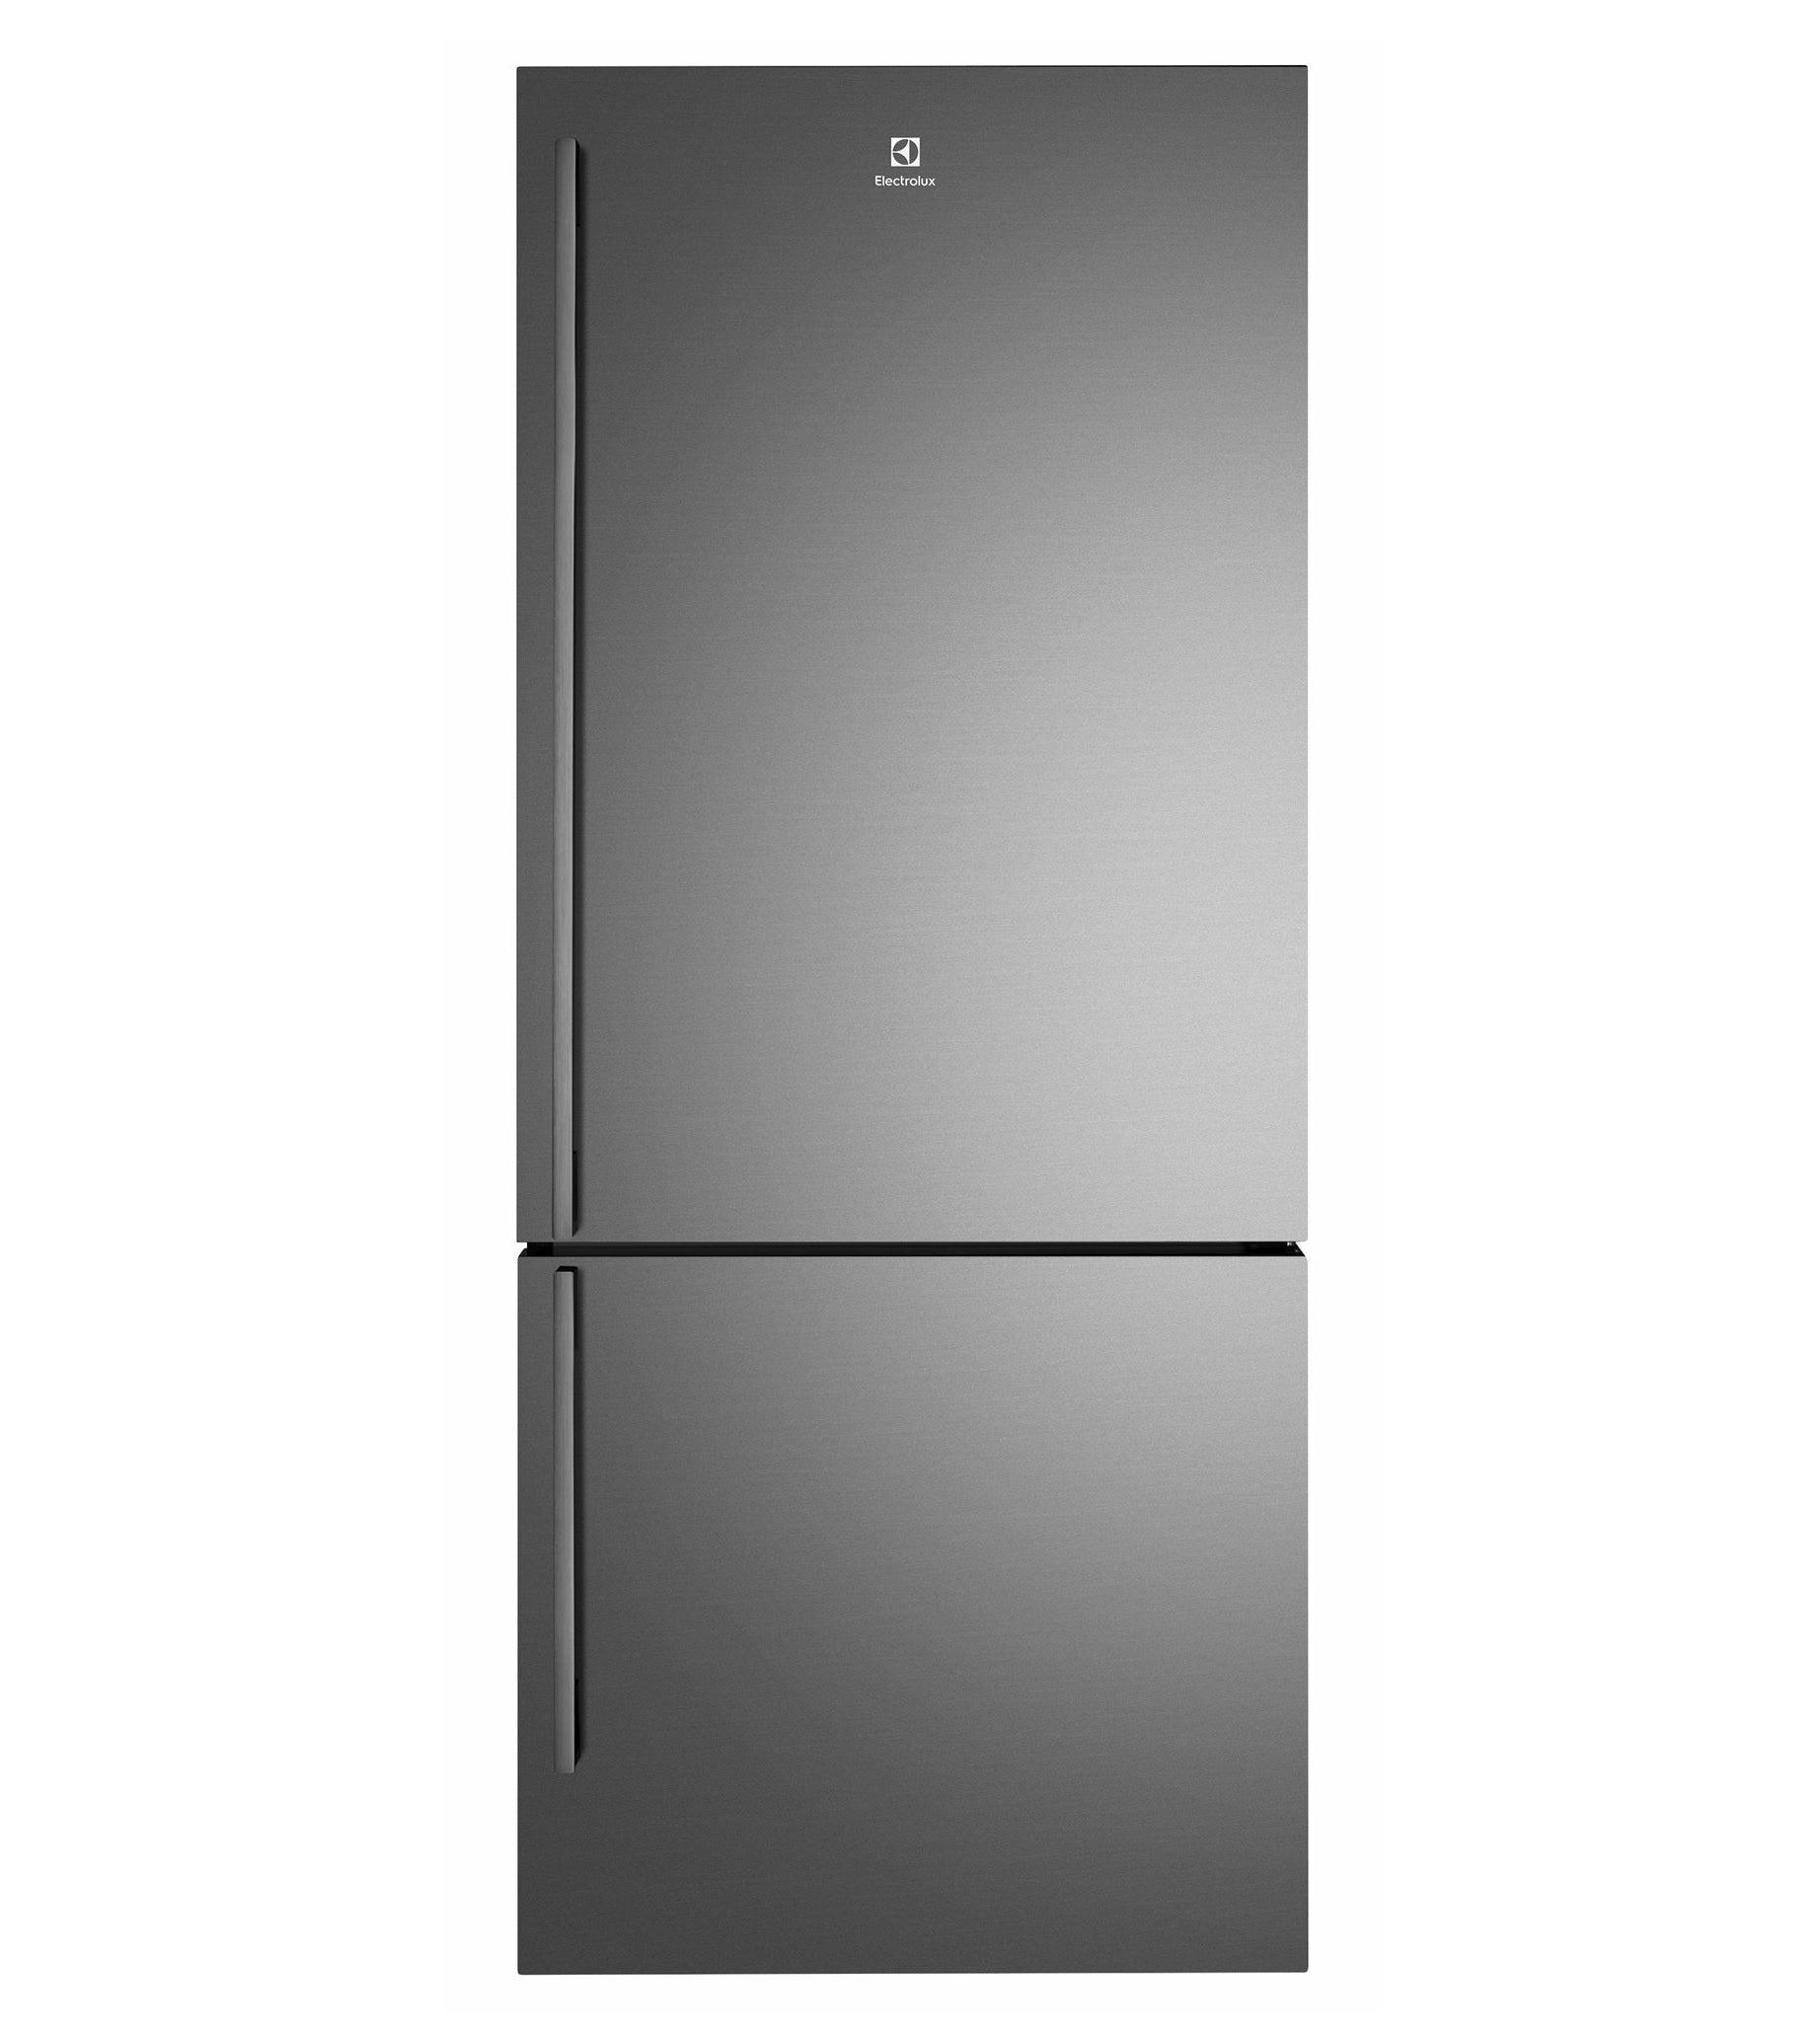 Electrolux EBE5307BC-R Refrigerator